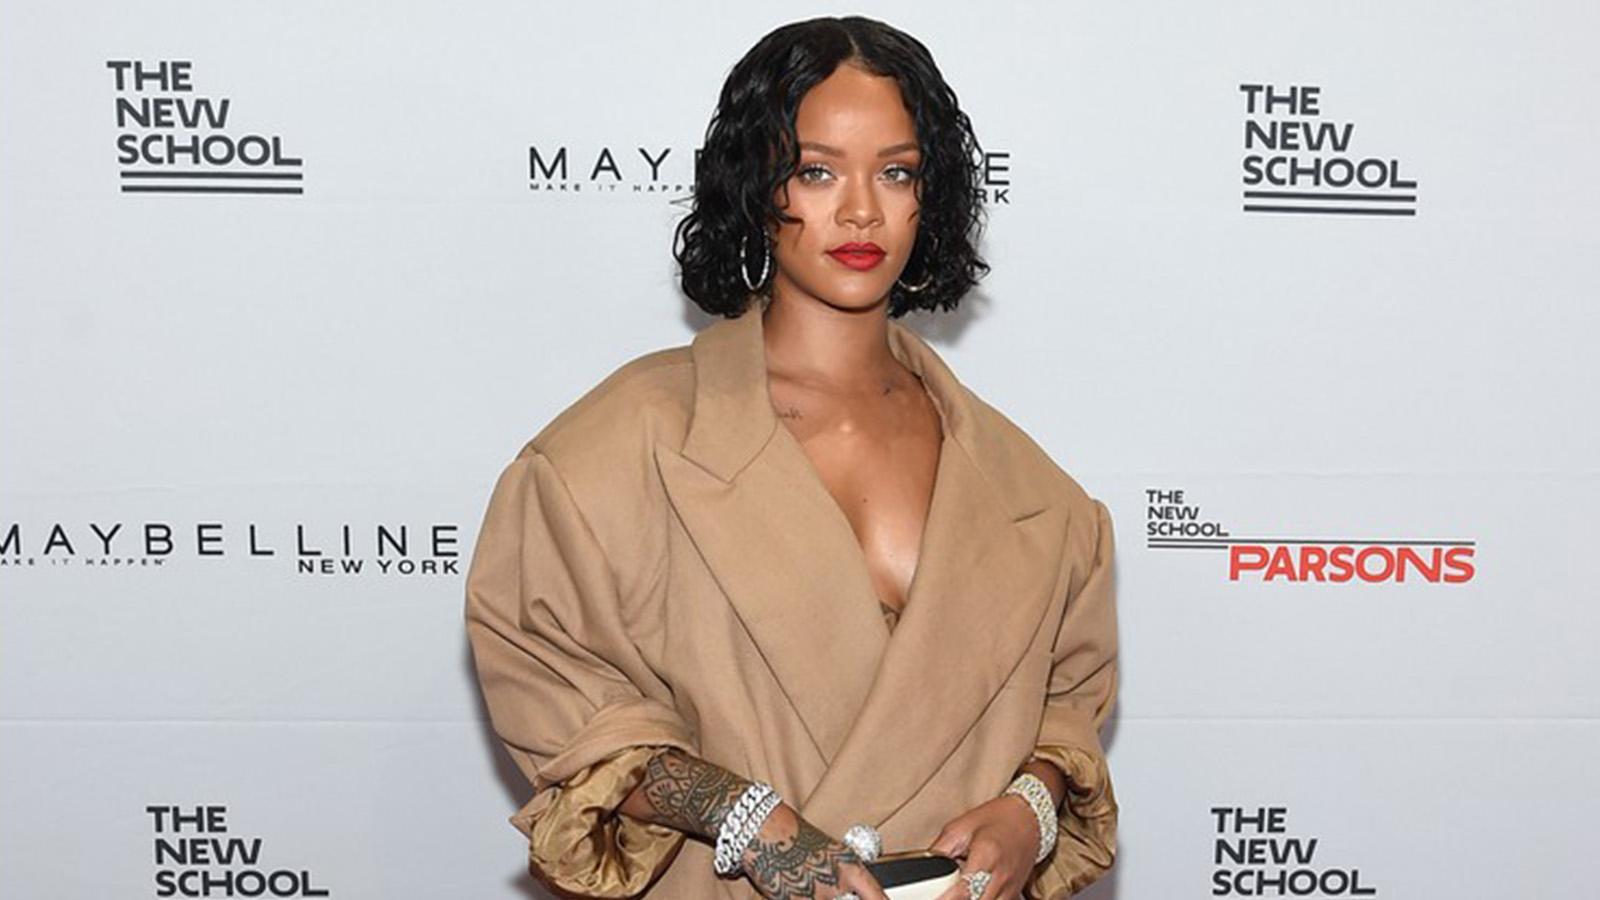 Rihanna_image